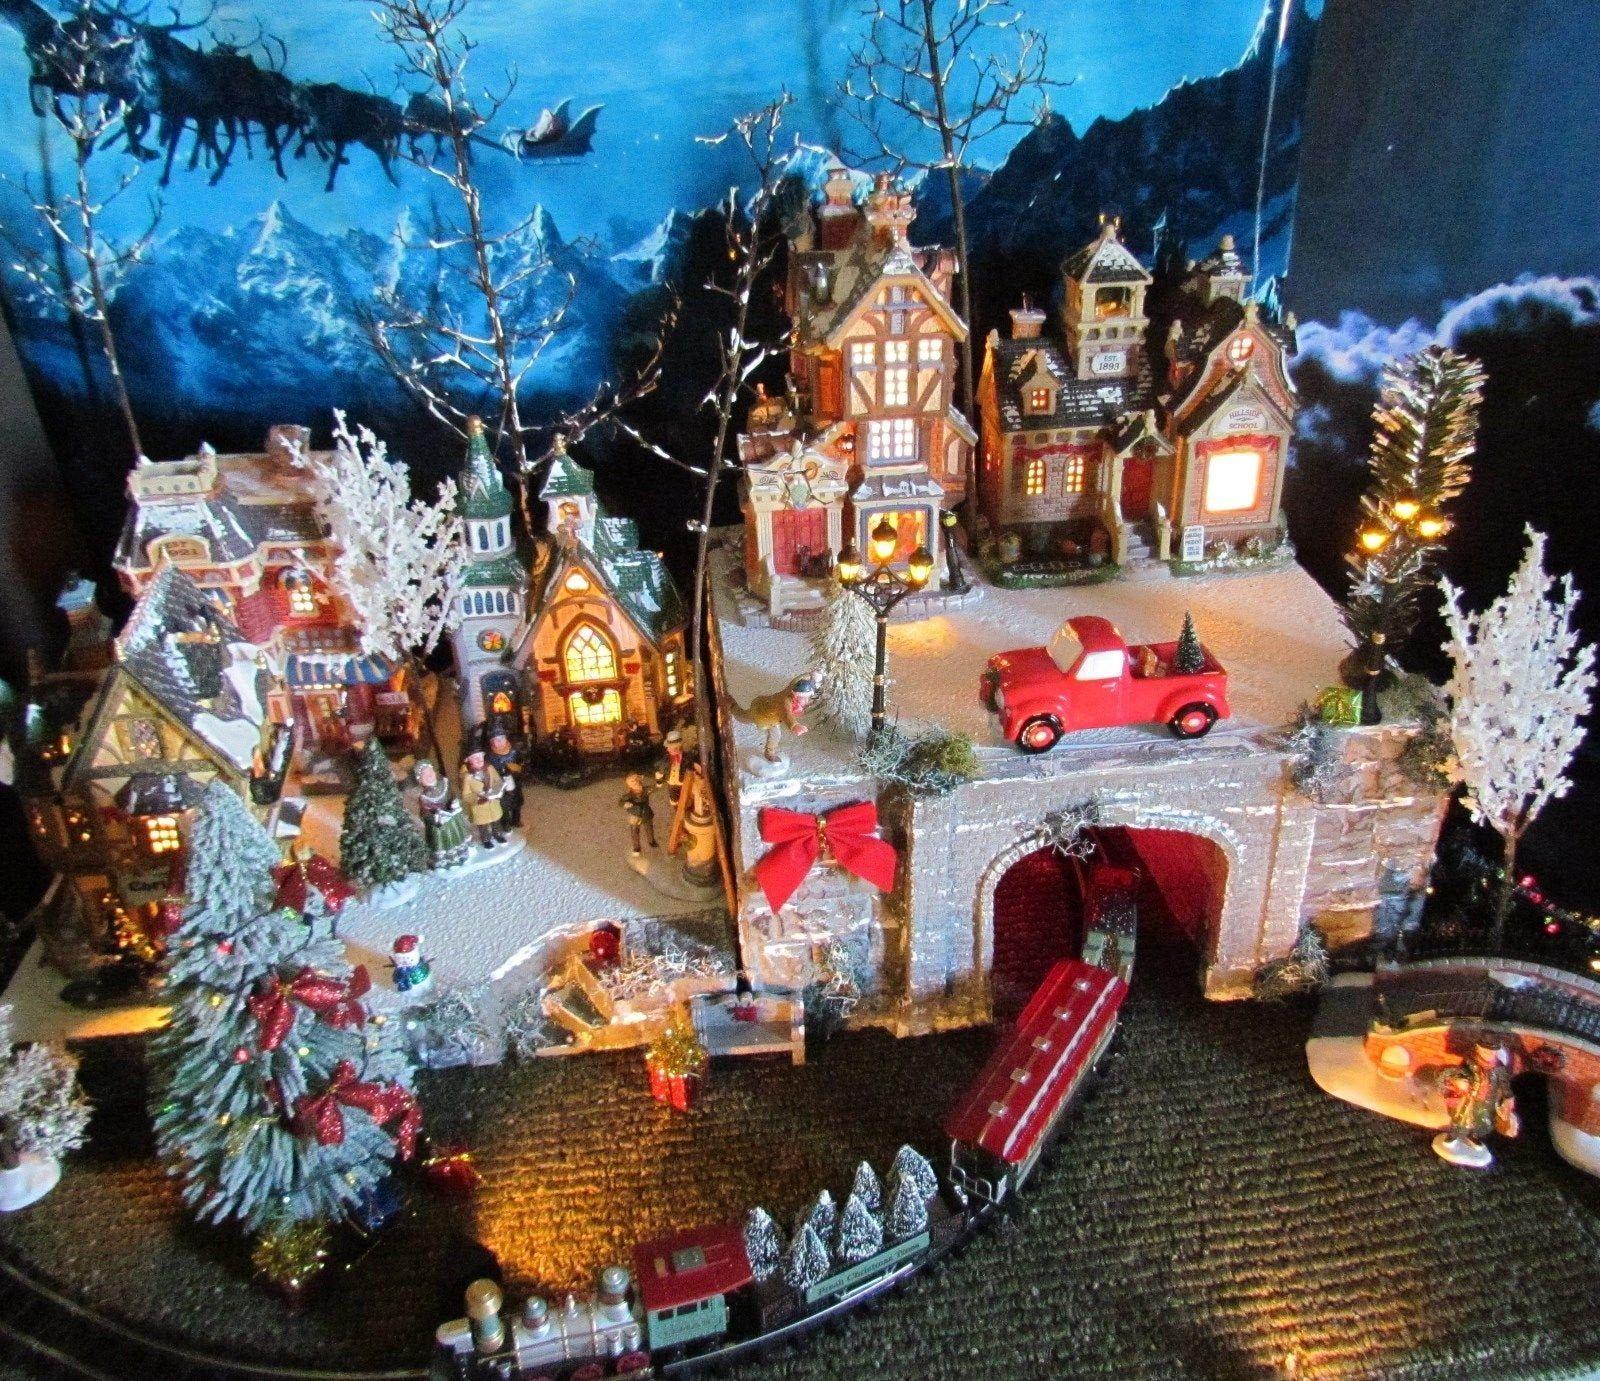 LIGHTED 28x12, 2-piece Train Tunnel Christmas display PLATFORM BASE, Miniature village, for Lemax & Dept 56 Snow village stand Qp